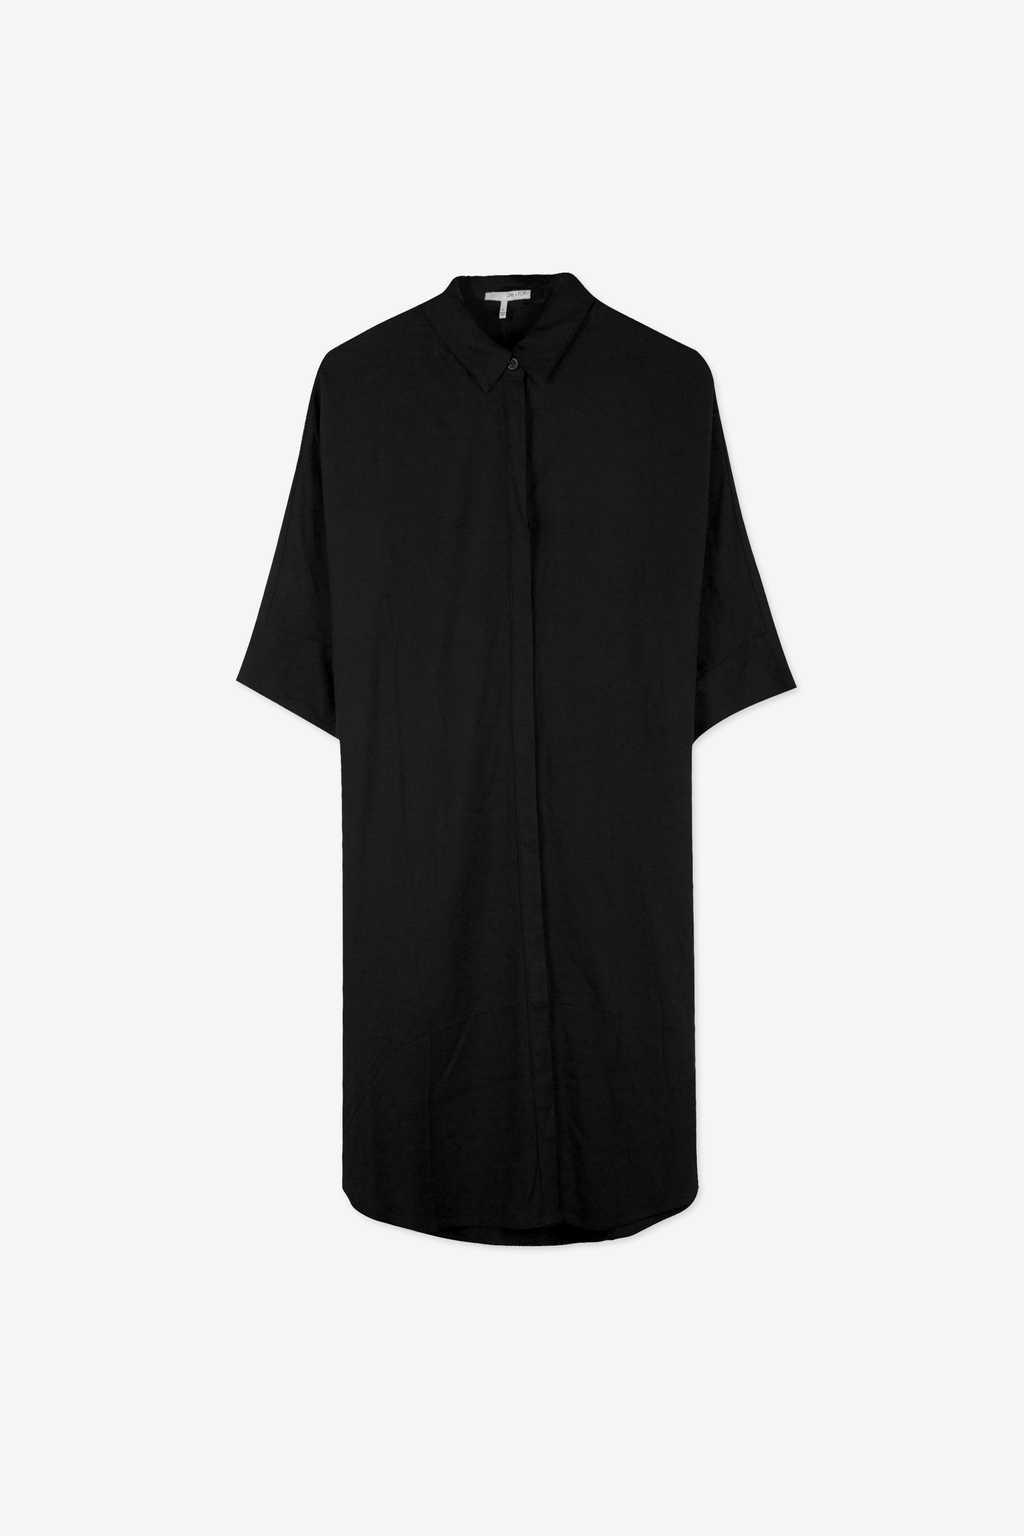 Dress 1083 Black 11